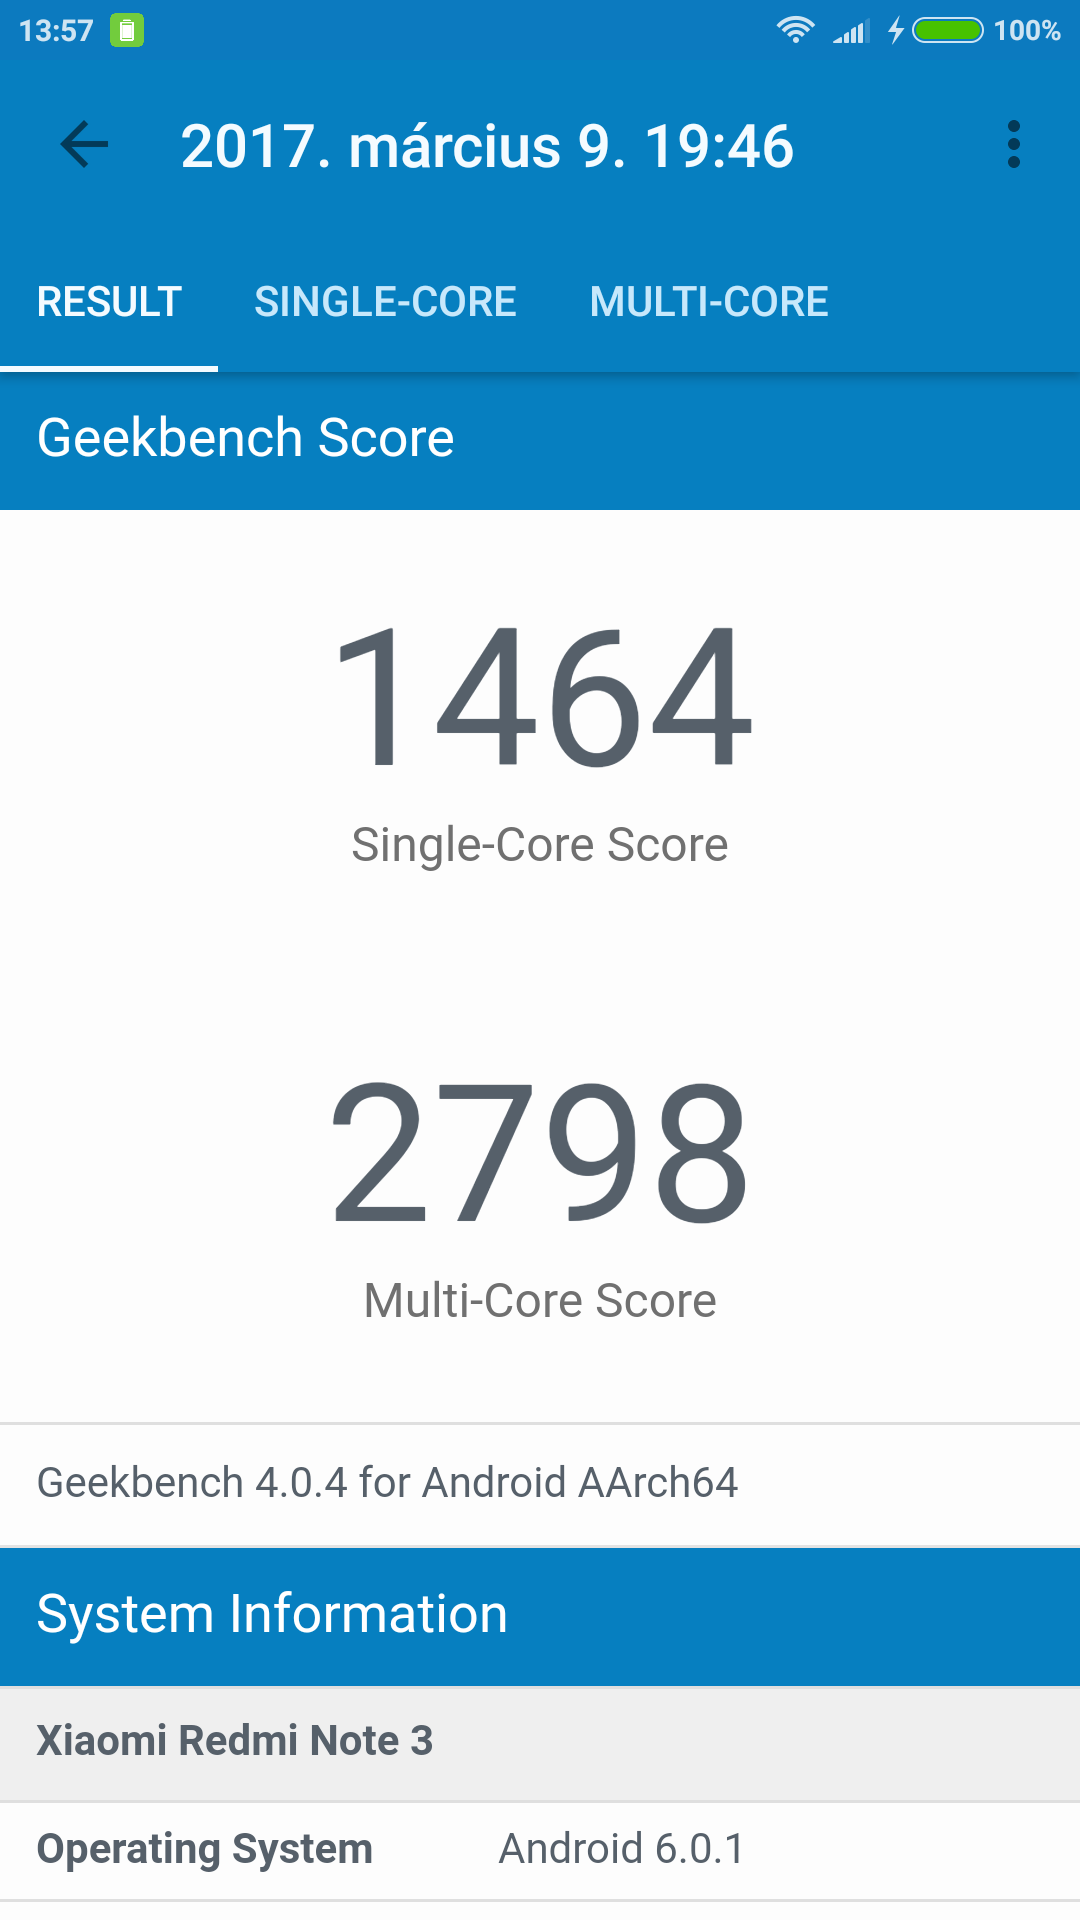 screenshot_2017-03-10-13-57-28-079_com_primatelabs_geekbench.png